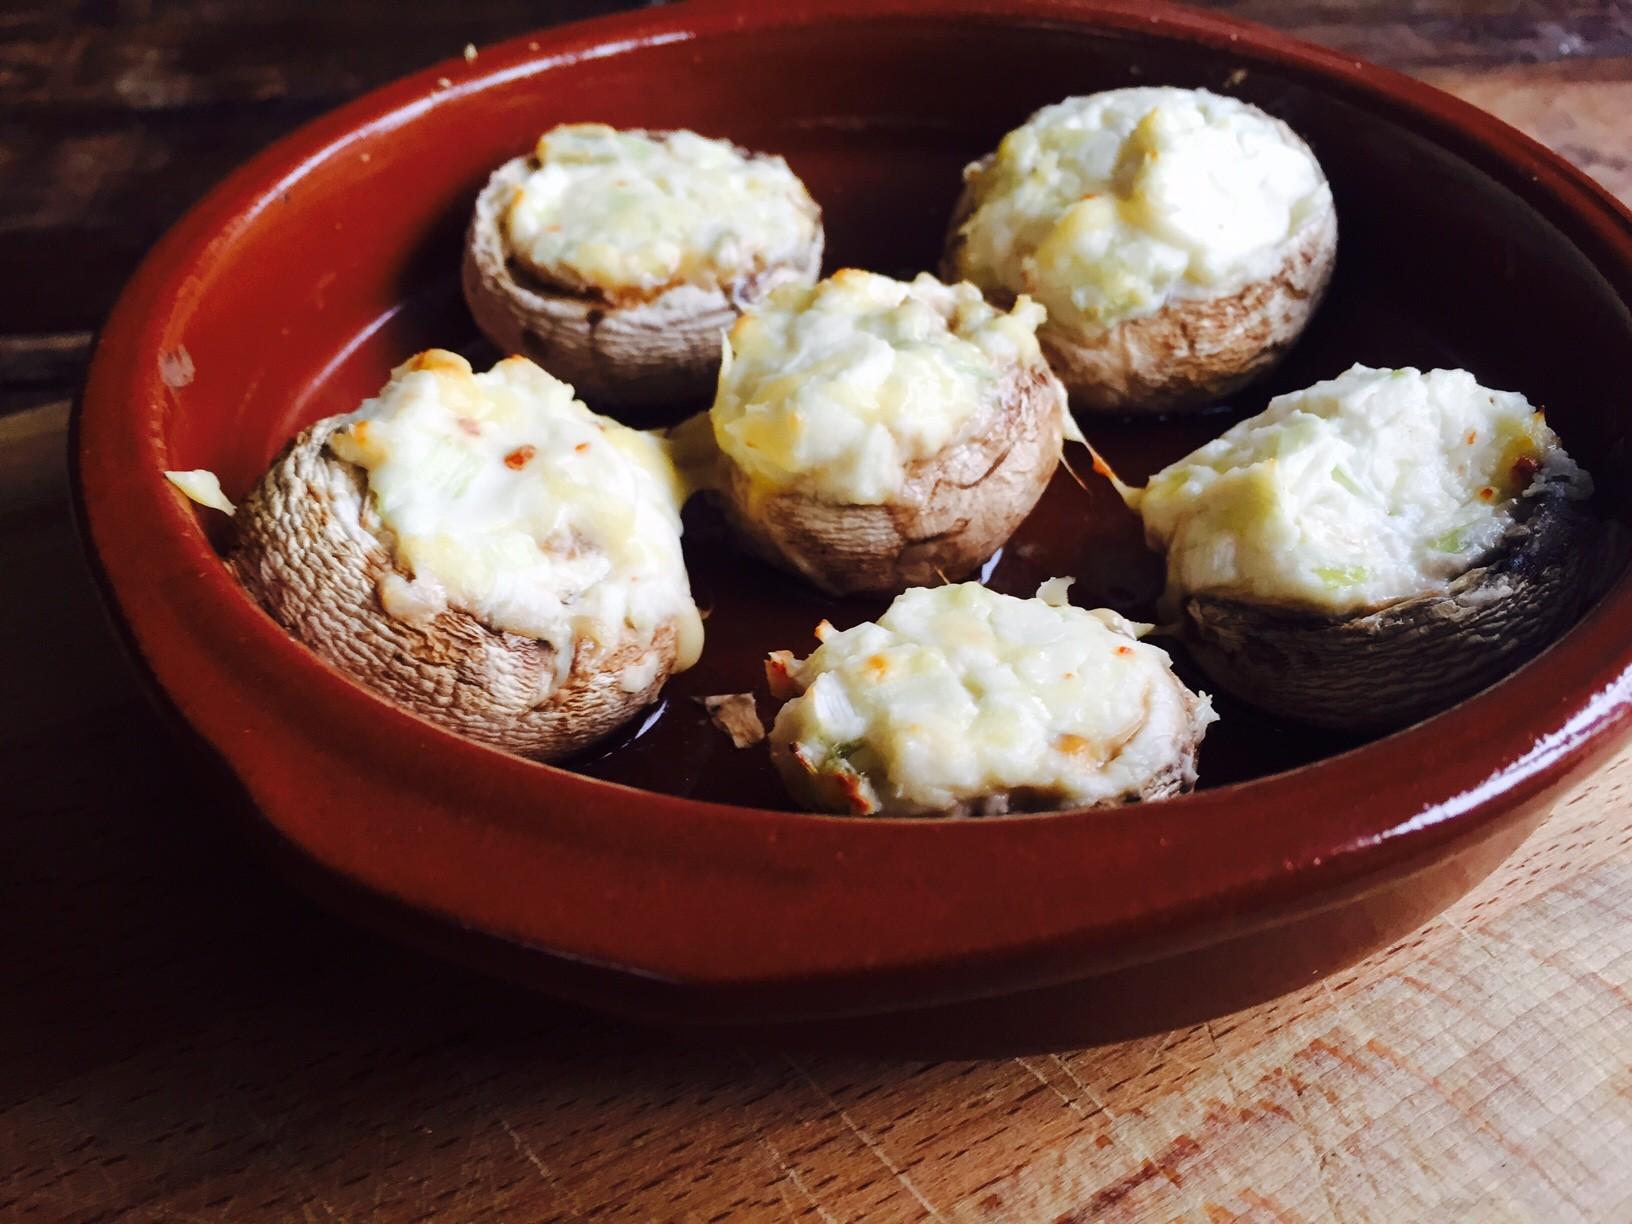 Gevulde champignons met kruidenroomkaas recept van foodblog Foodinista